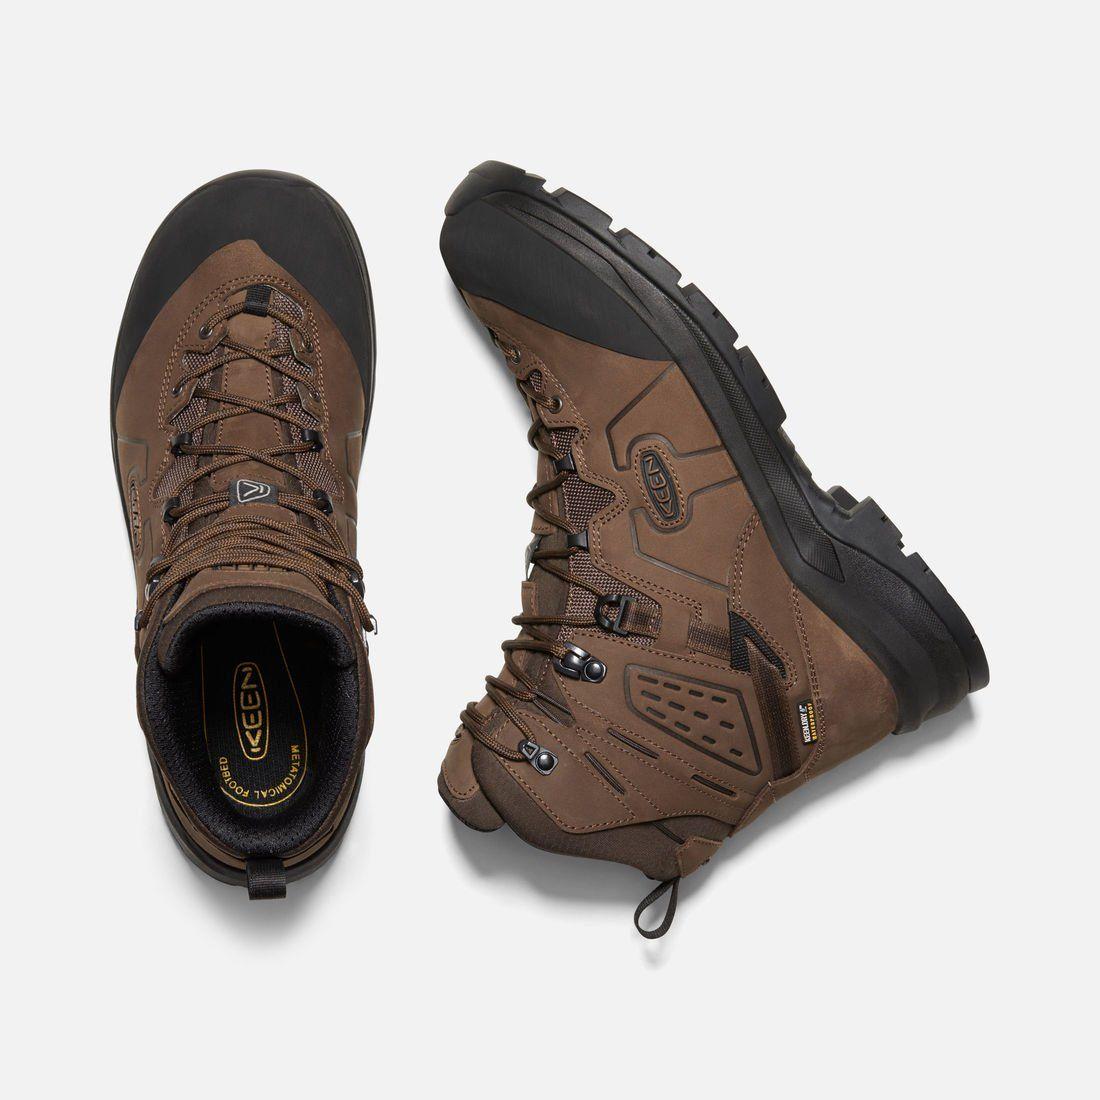 Men S Karraig Mid Waterproof Hiking Boots Keen Footwear Steel Toe Work Boots Hiking Boots Boots